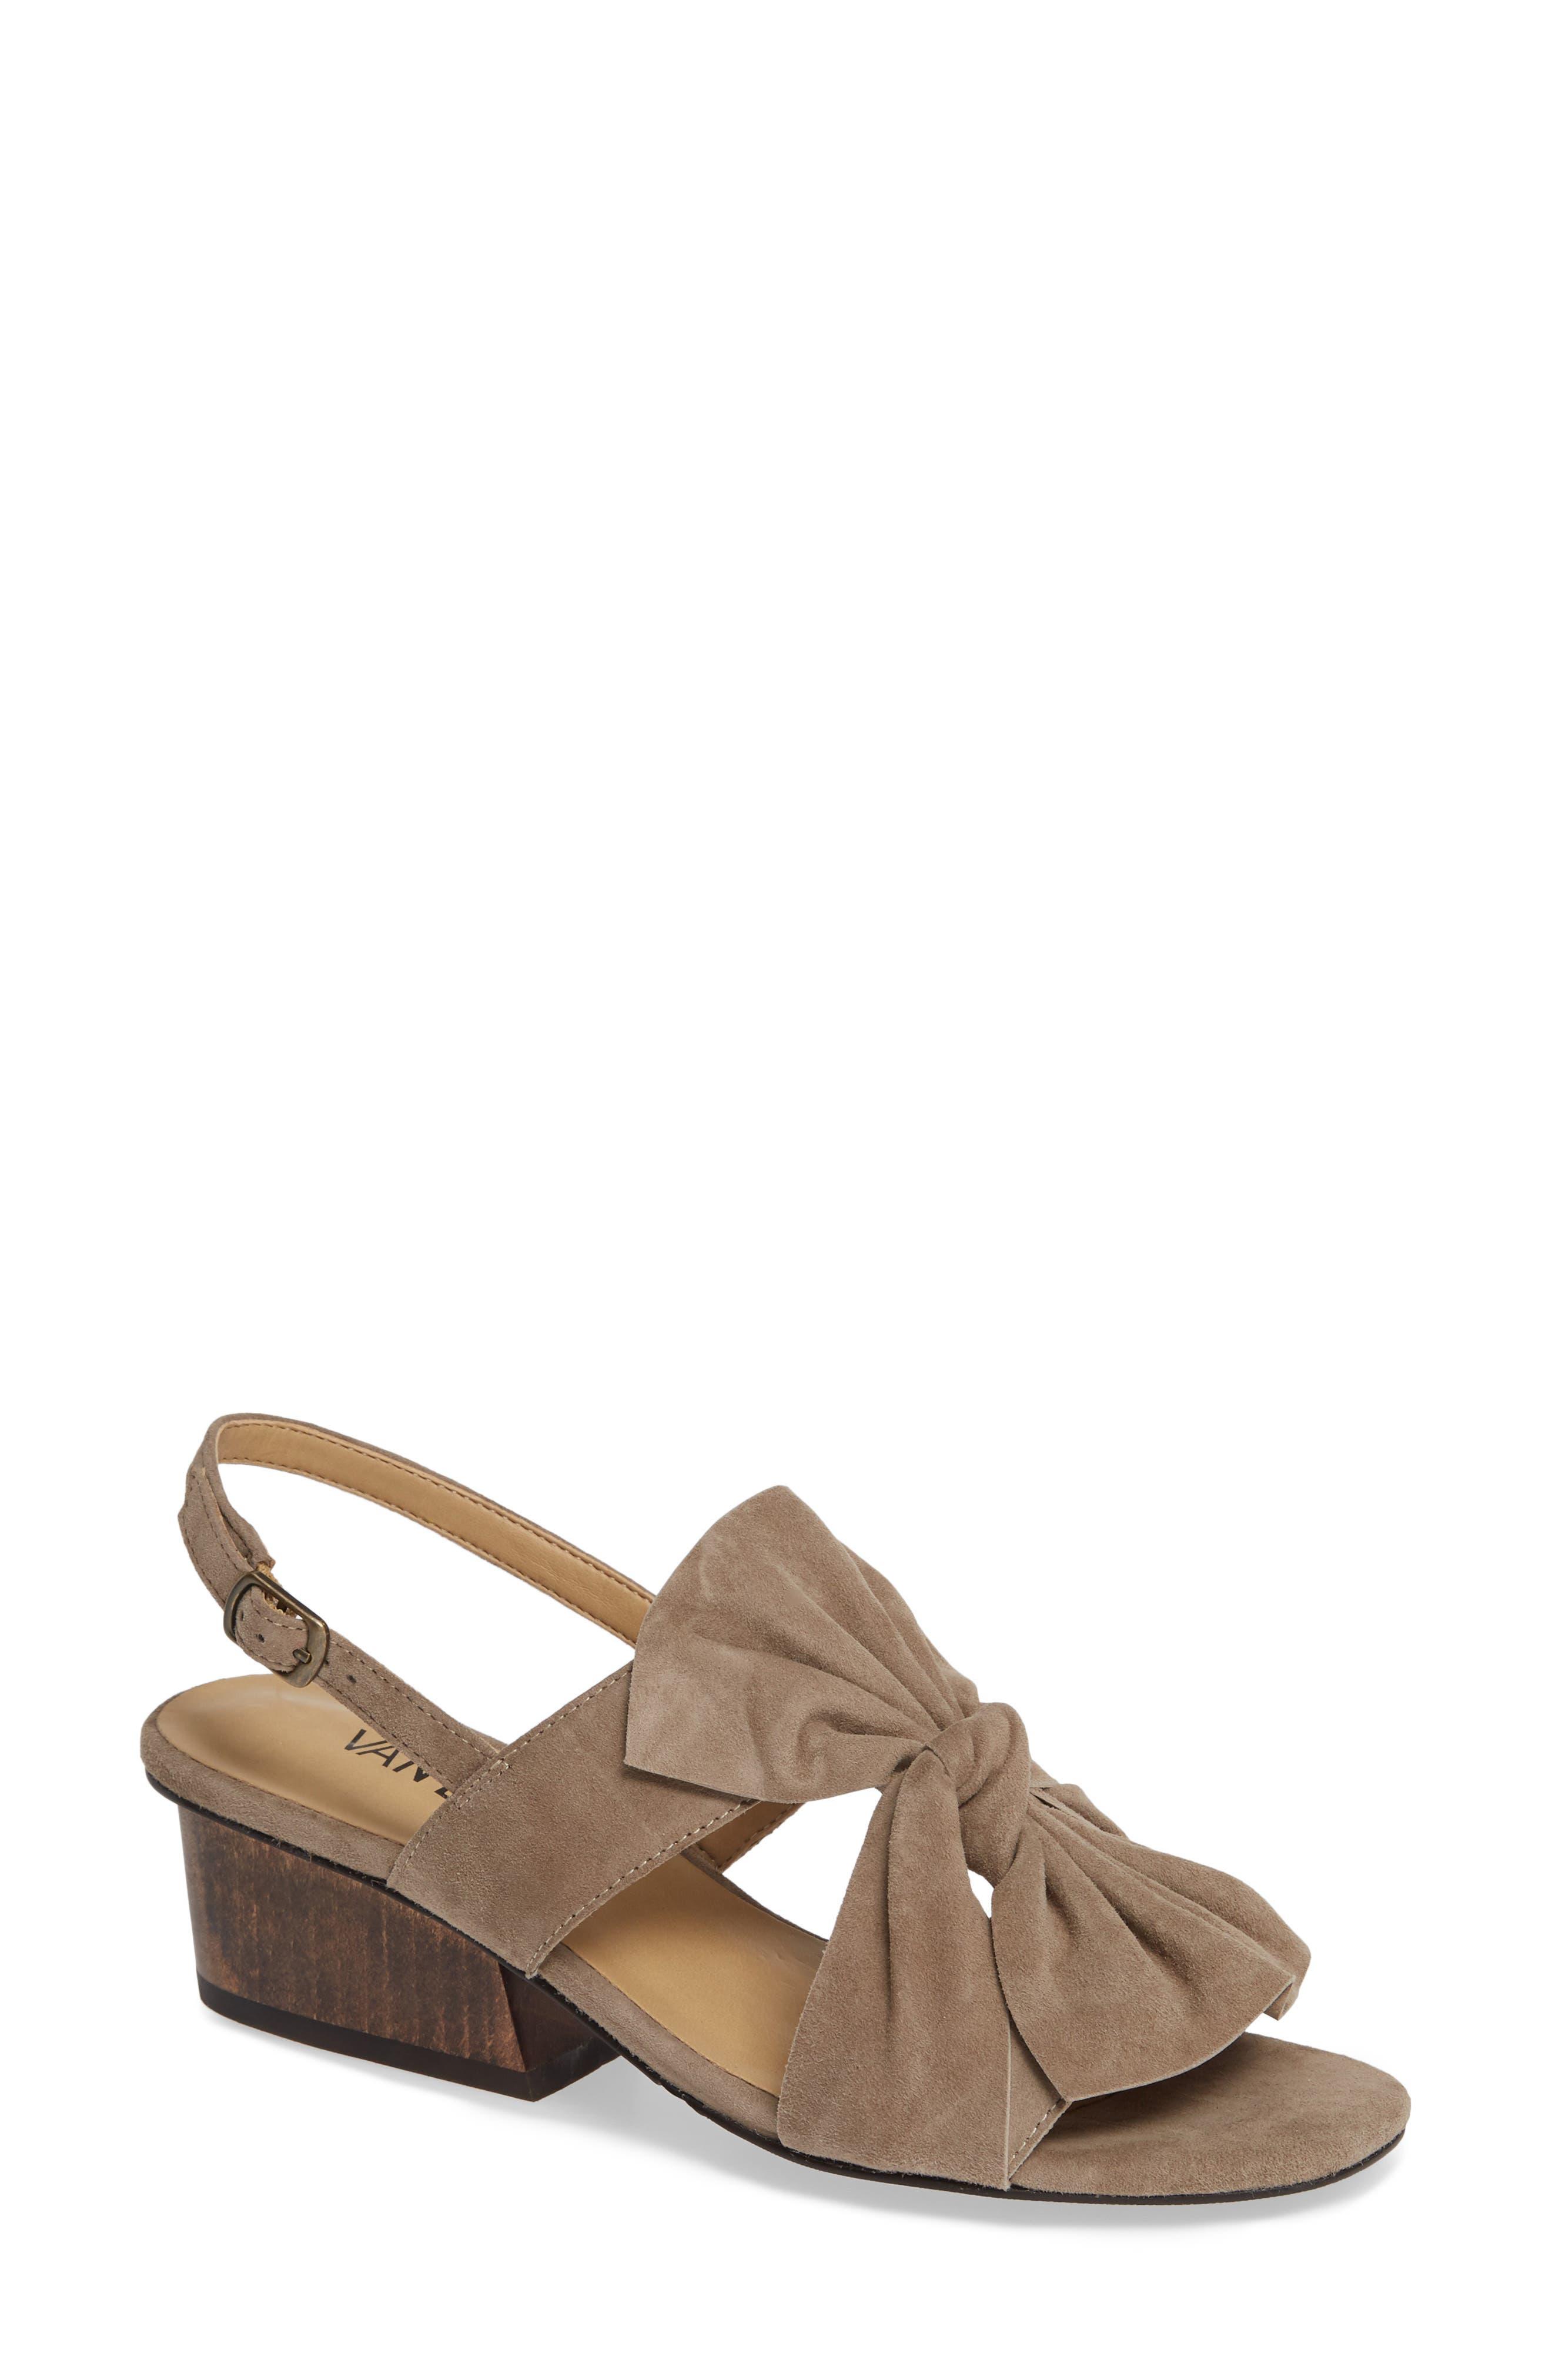 Camey Slingback Sandal,                         Main,                         color, TRUFFLE SUEDE